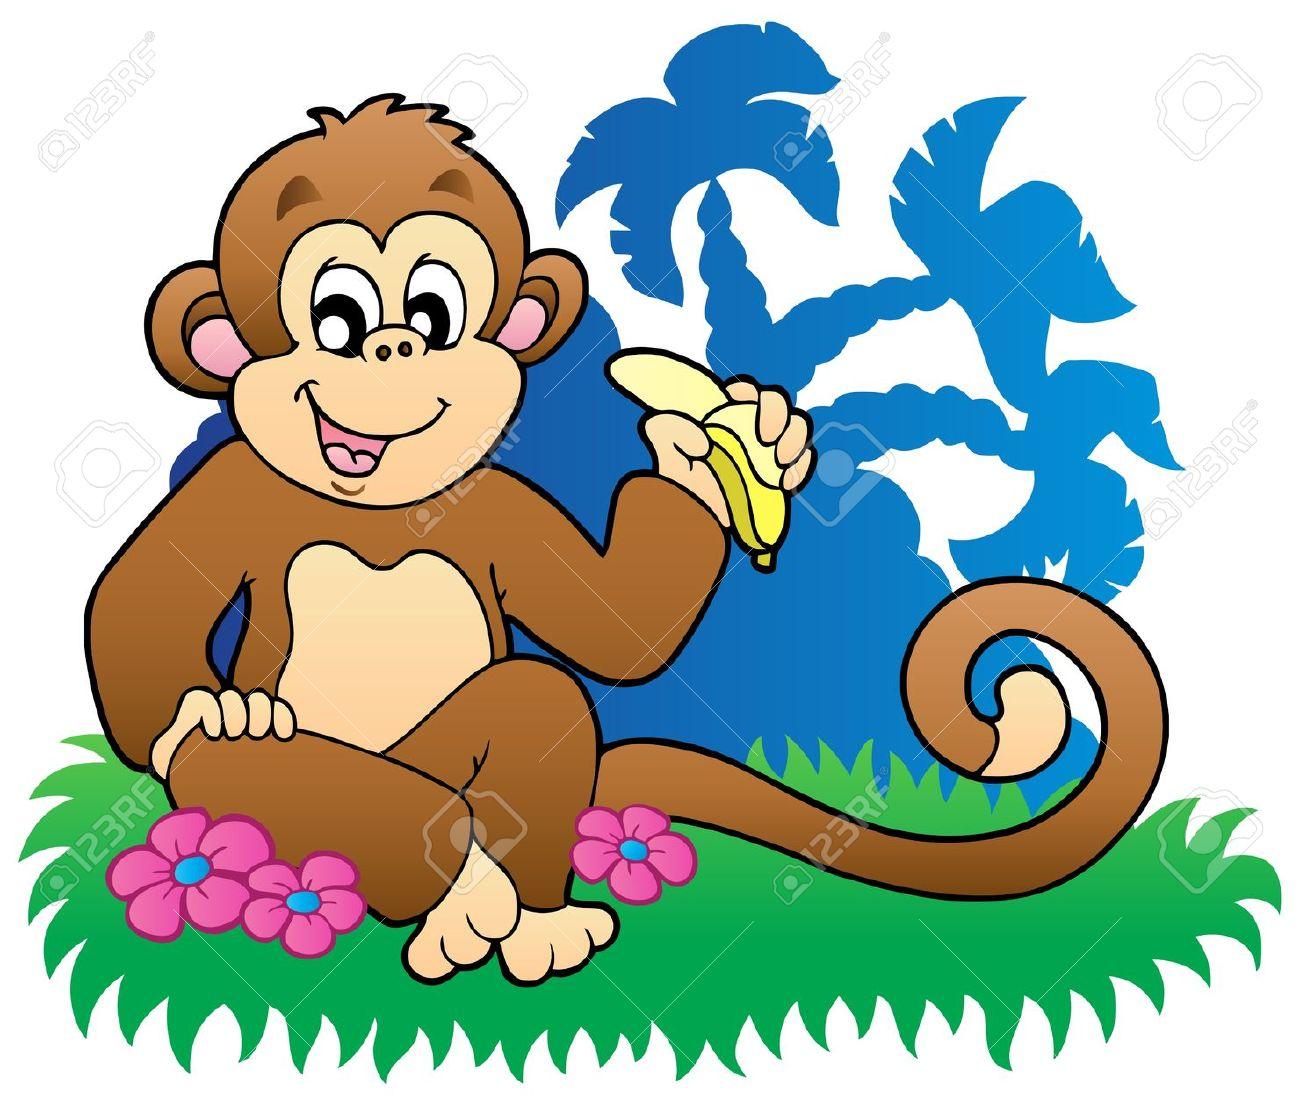 Monkey Eating Banana Near Palms Royalty Free Cliparts, Vectors.